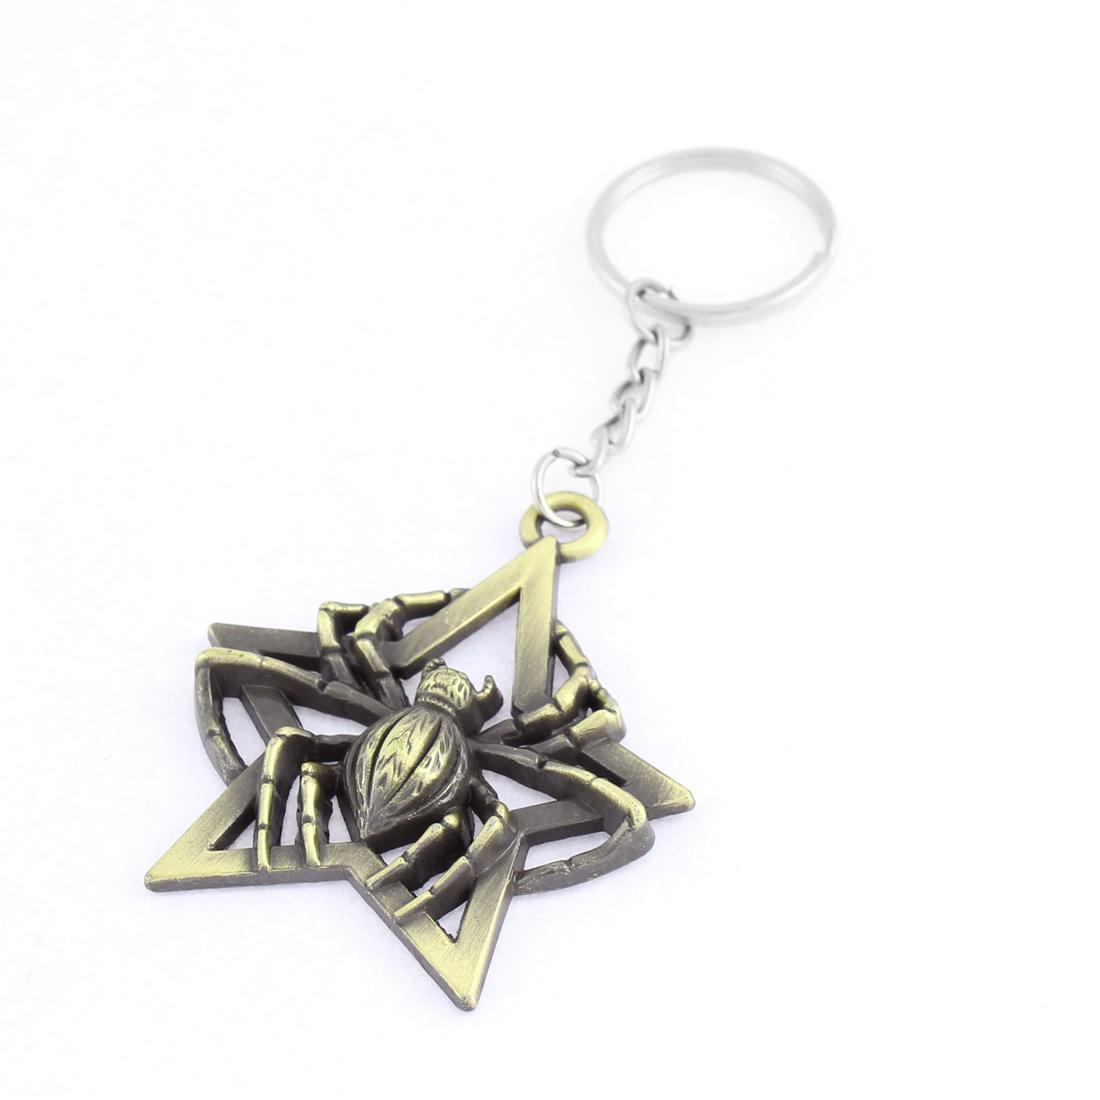 Retro Style Spider Star Designed Dangling Pendant Keychain Key Ring Bronze Tone